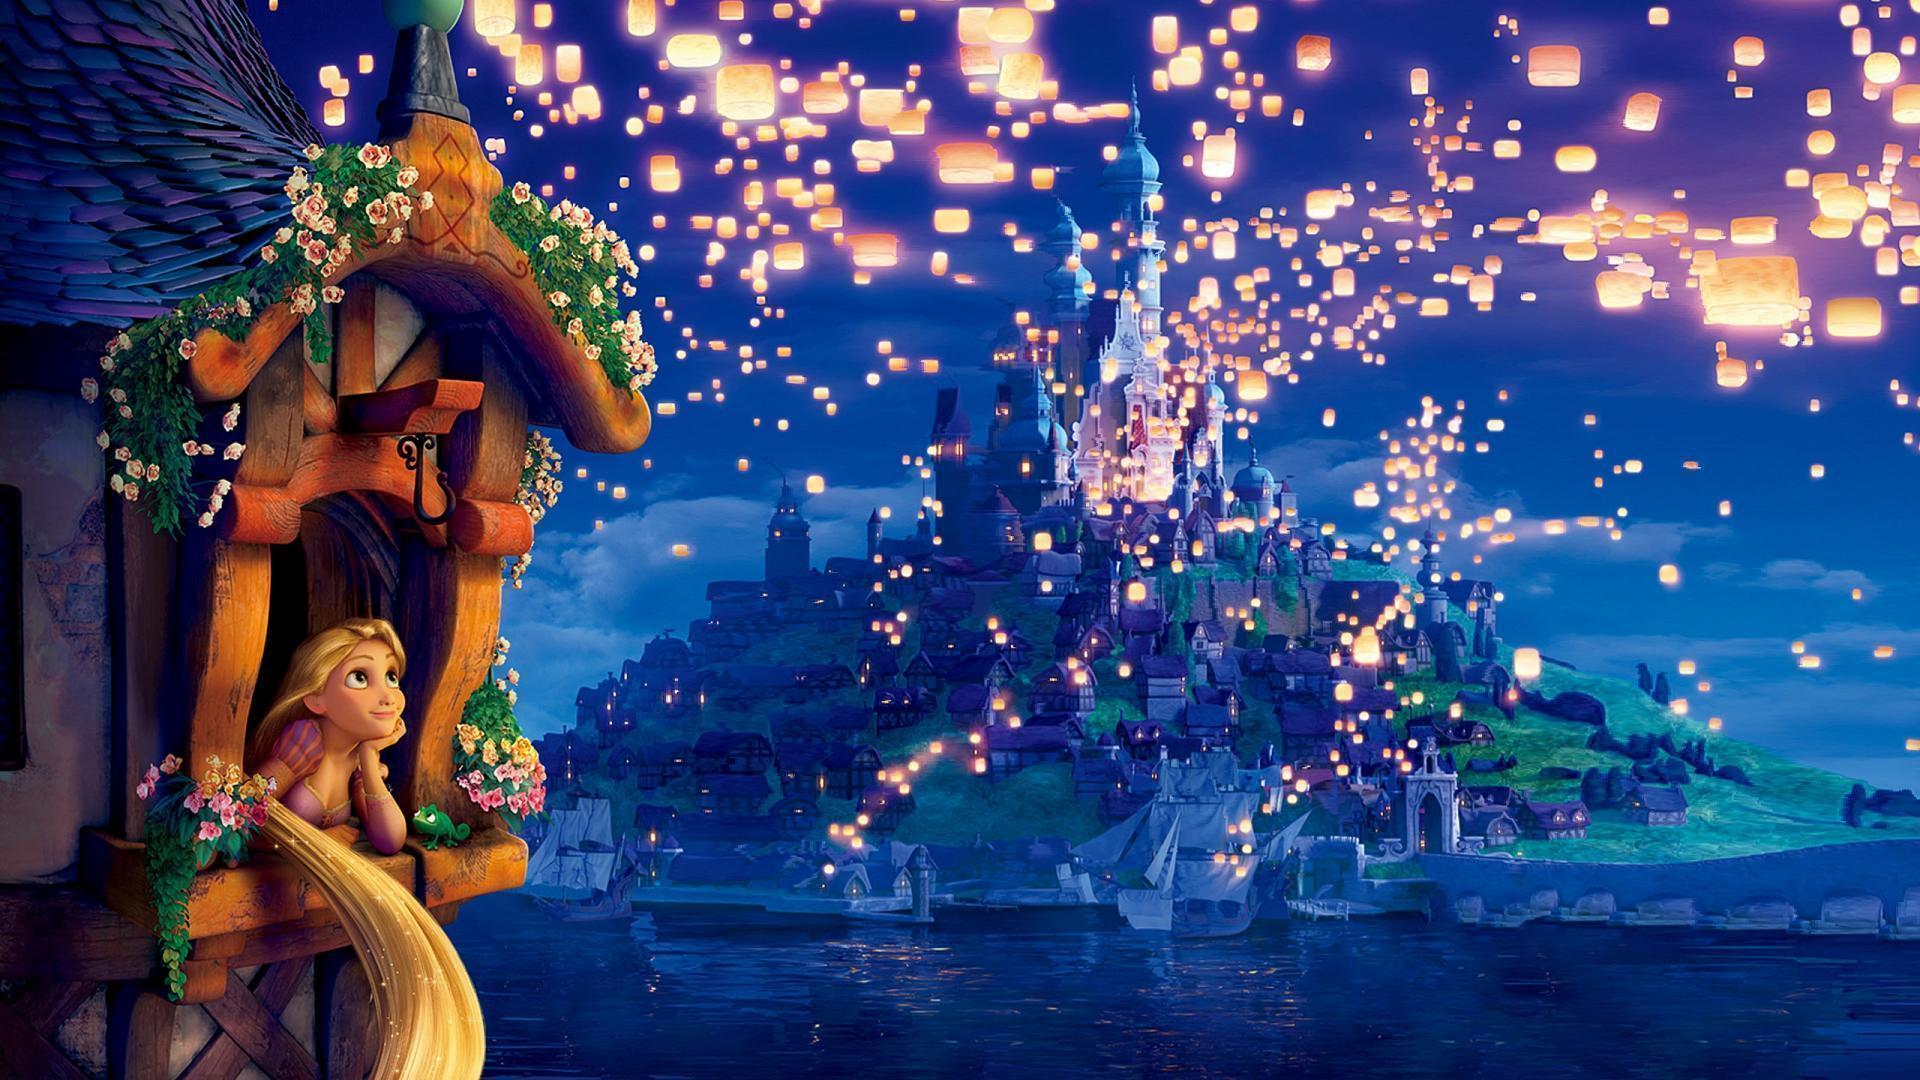 Disney tangled wallpapers wallpaper cave - Rapunzel wallpaper ...